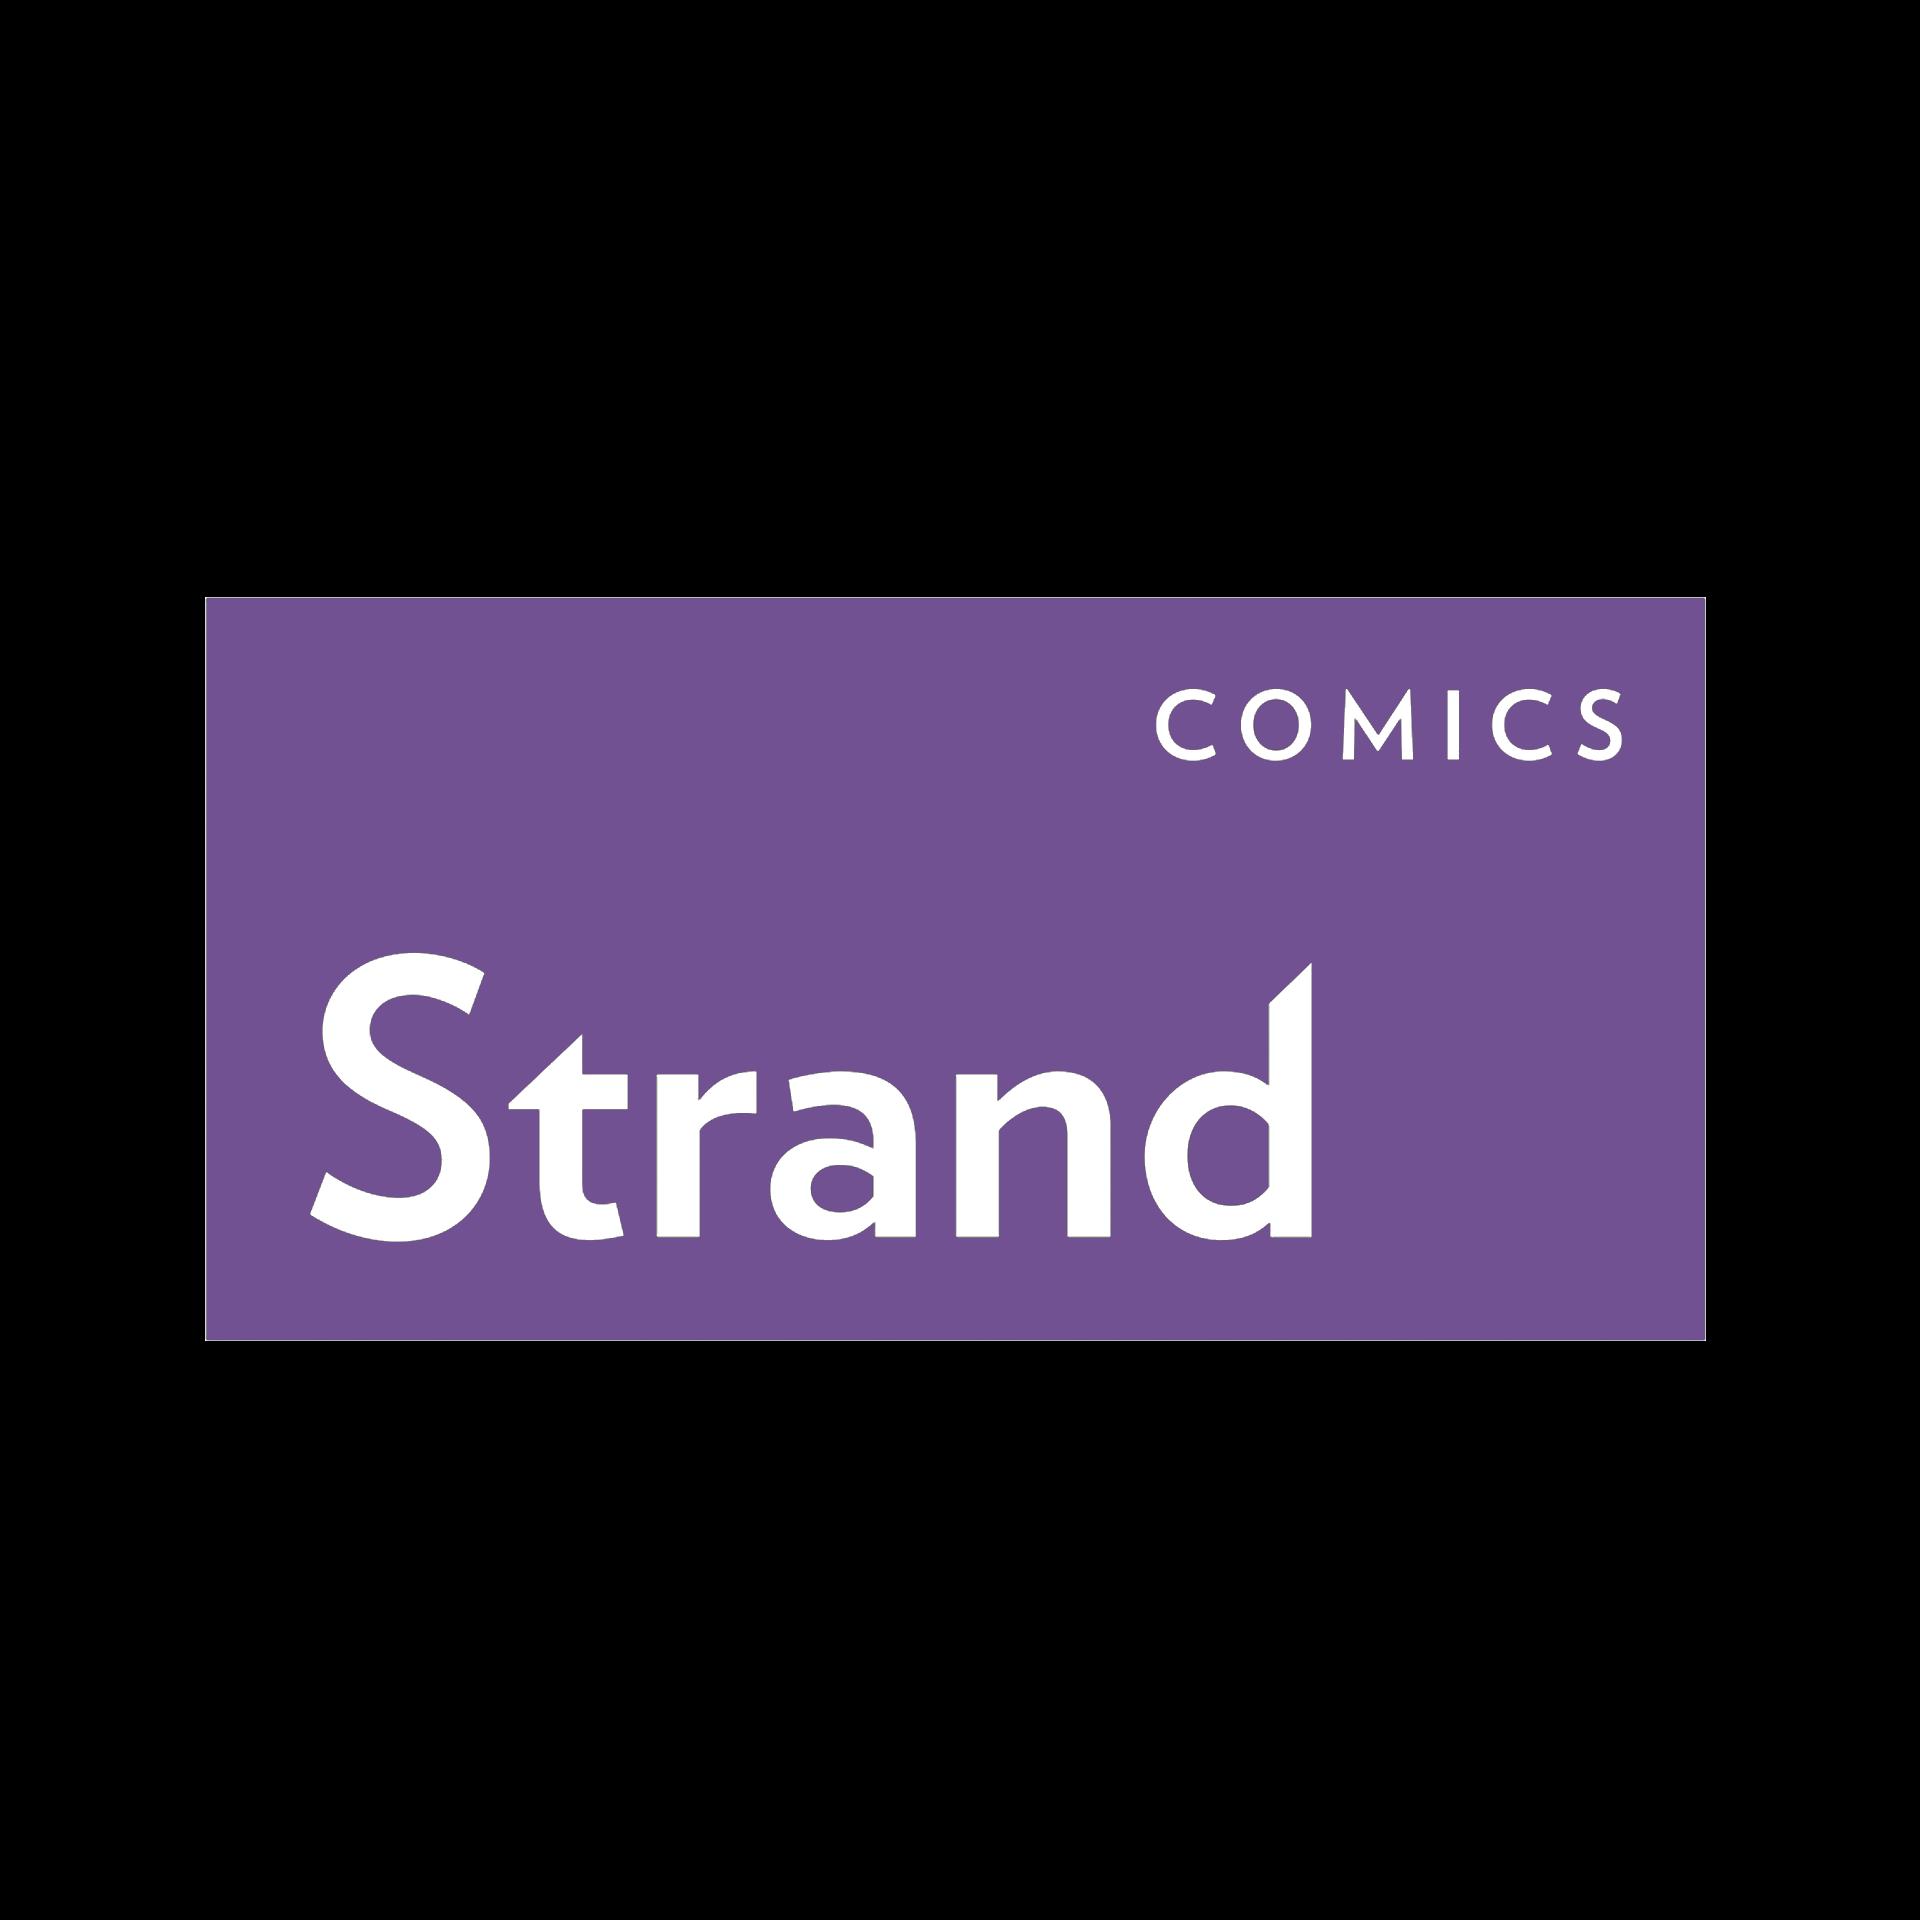 Strand Forlag AS